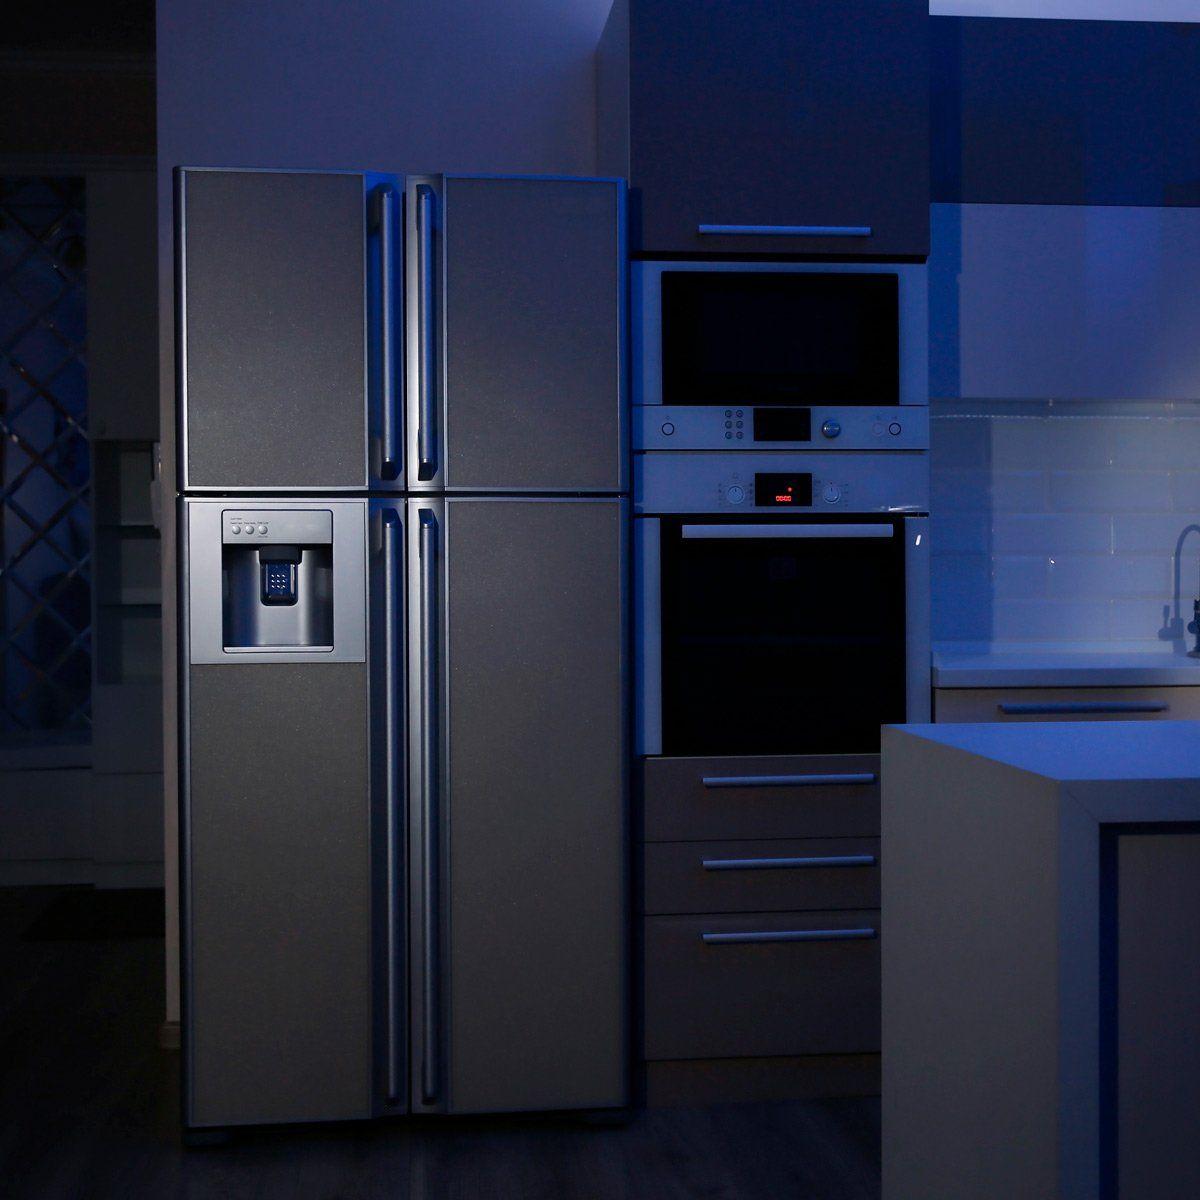 kitchenaid refrigerator troubleshooting not cooling